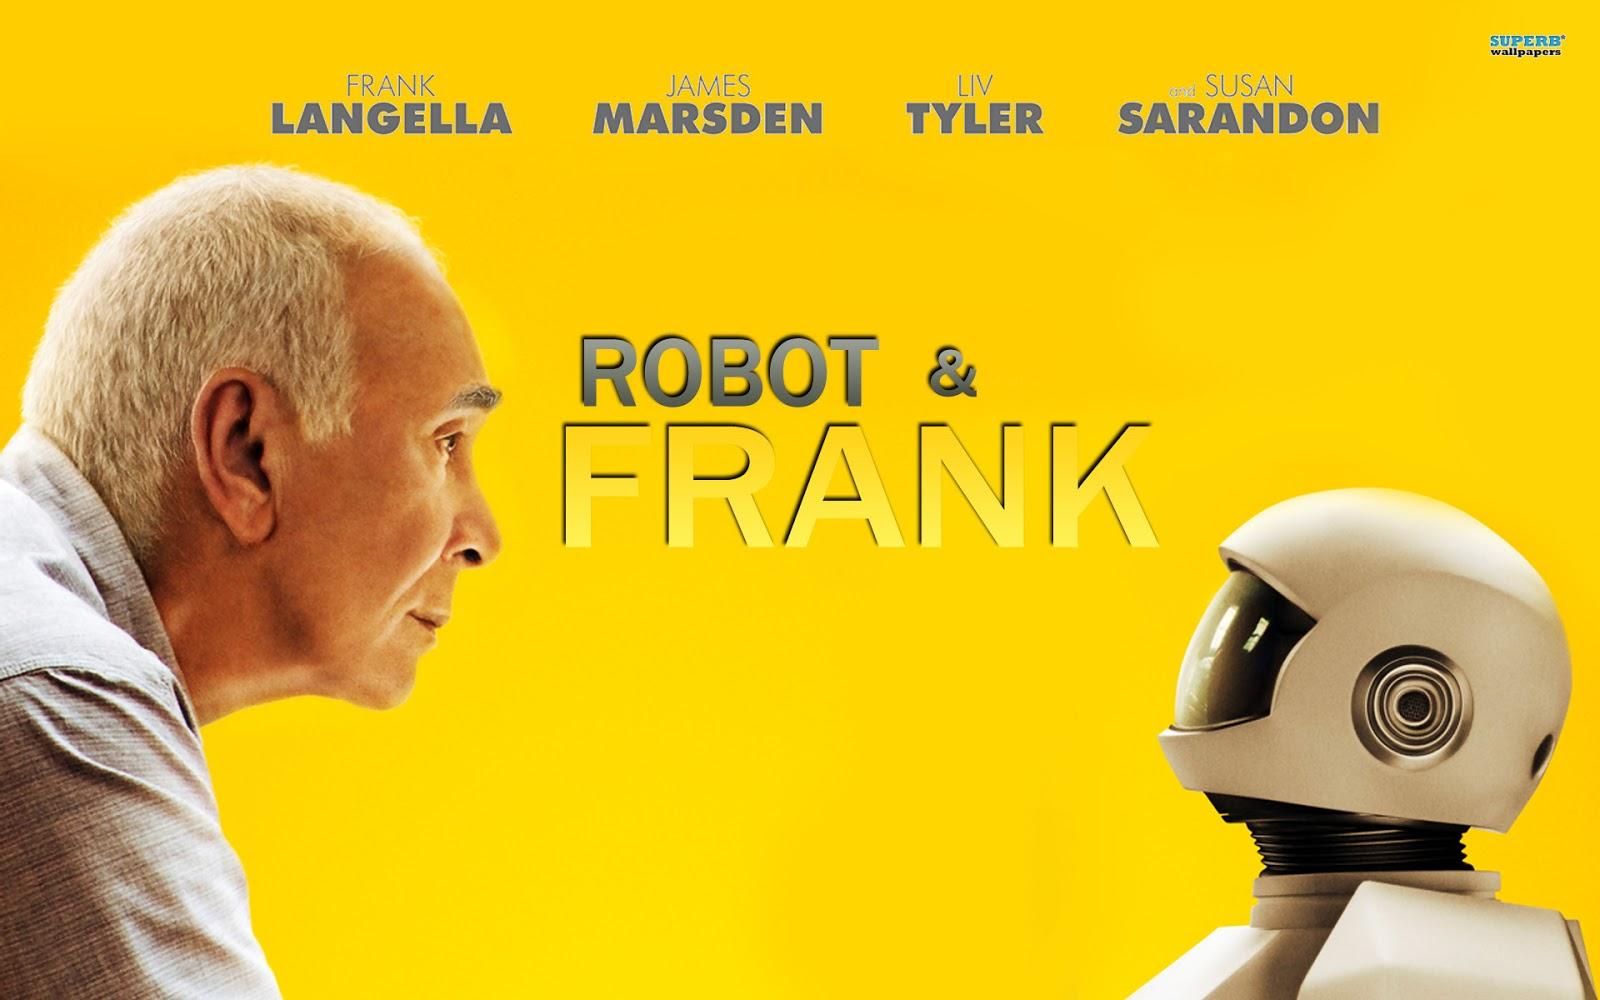 http://2.bp.blogspot.com/-D1h2cwuK9HY/UNy7Ddg6kEI/AAAAAAAAEVA/3sRYN817-yQ/s1600/frank-robot-and-frank-13724-1920x1200.jpg